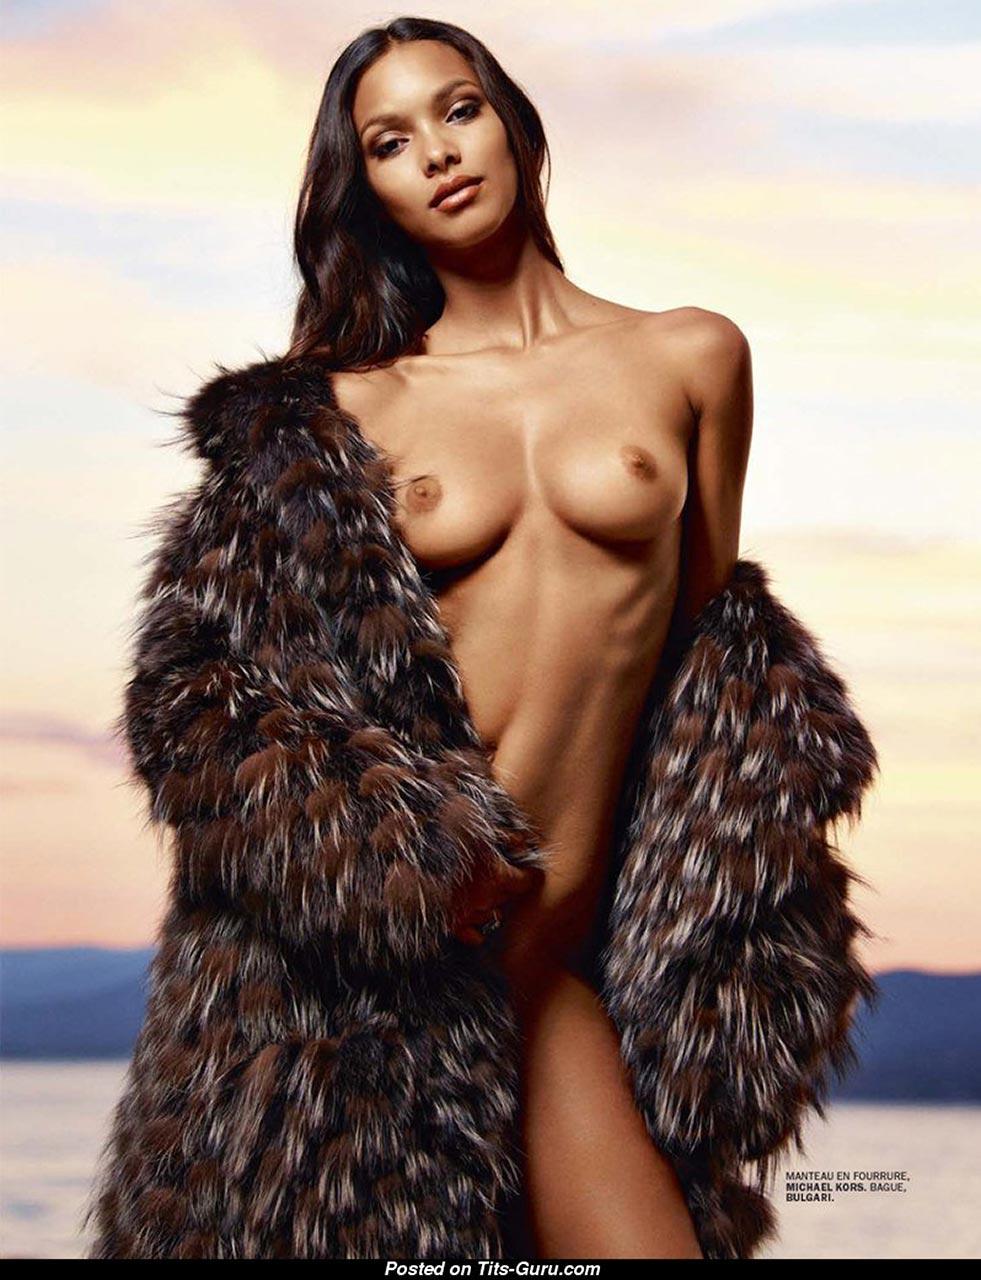 Hot Boobs Lais Ribeiro naked photo 2017